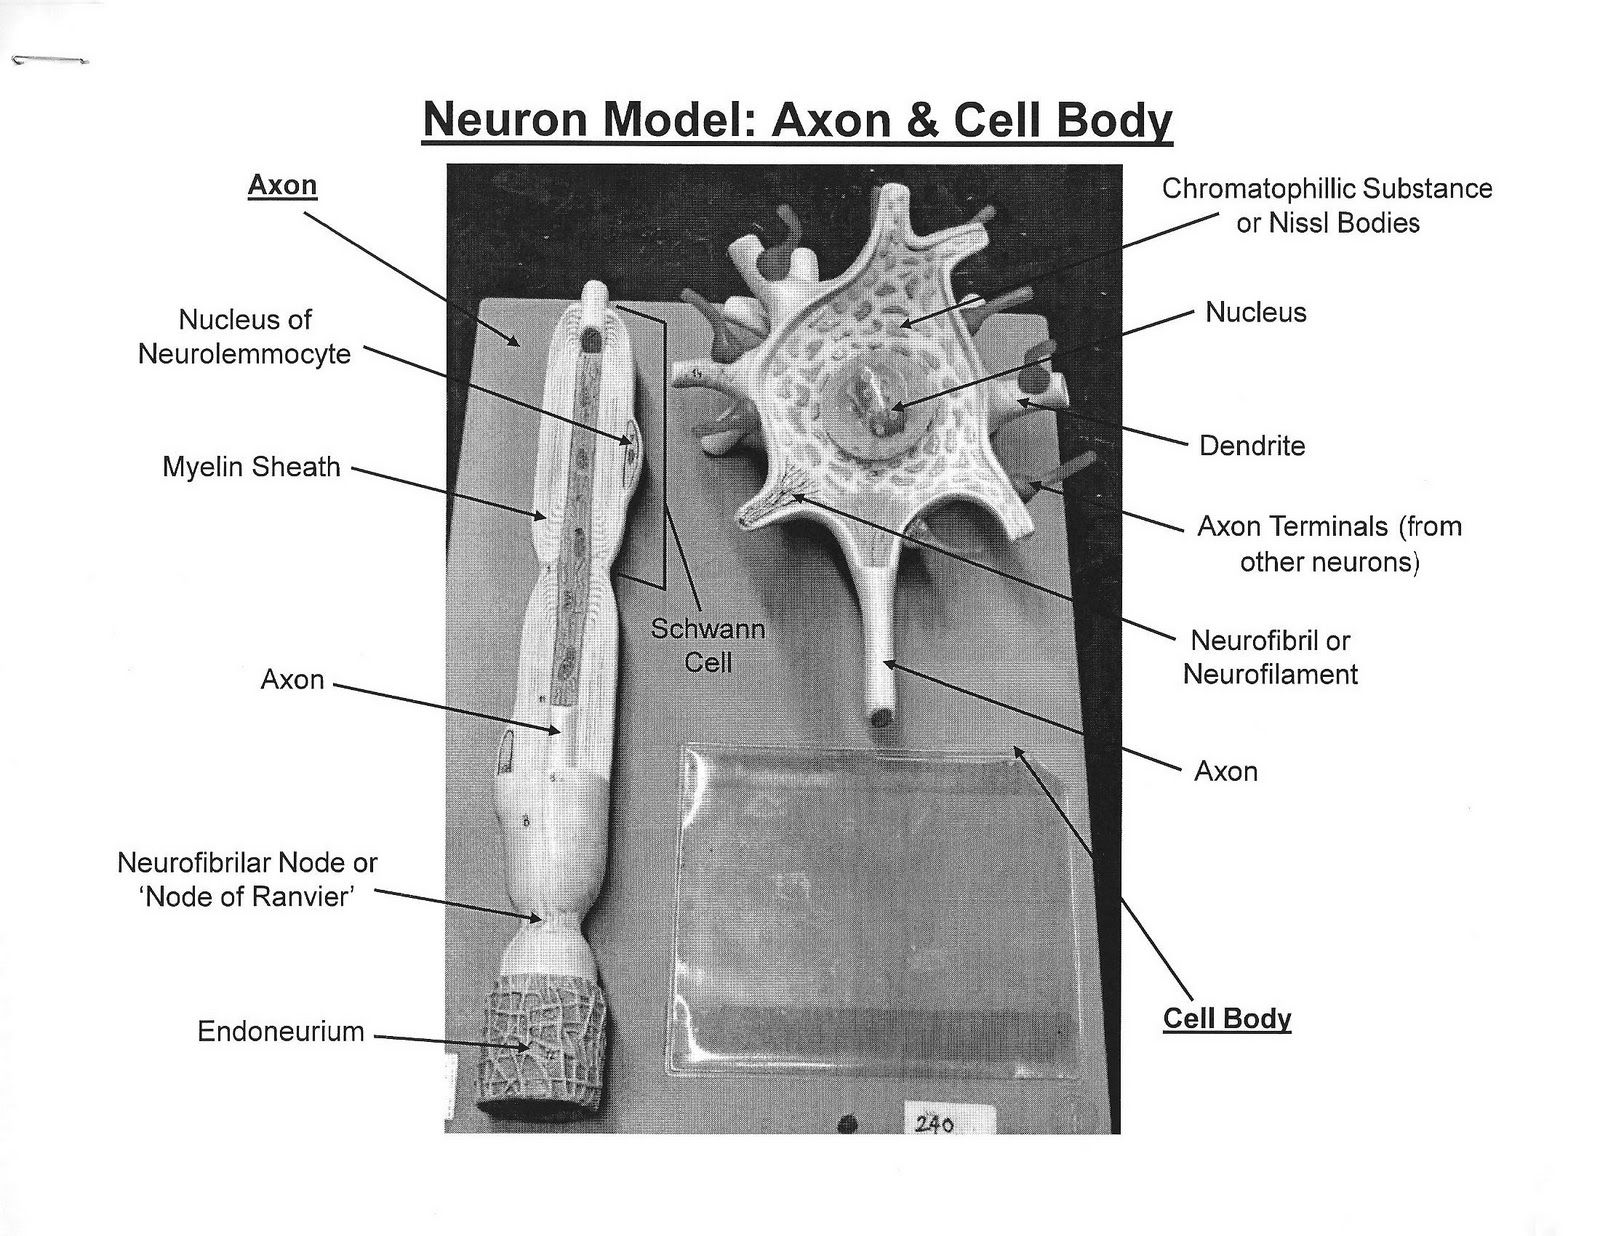 Neuron Model